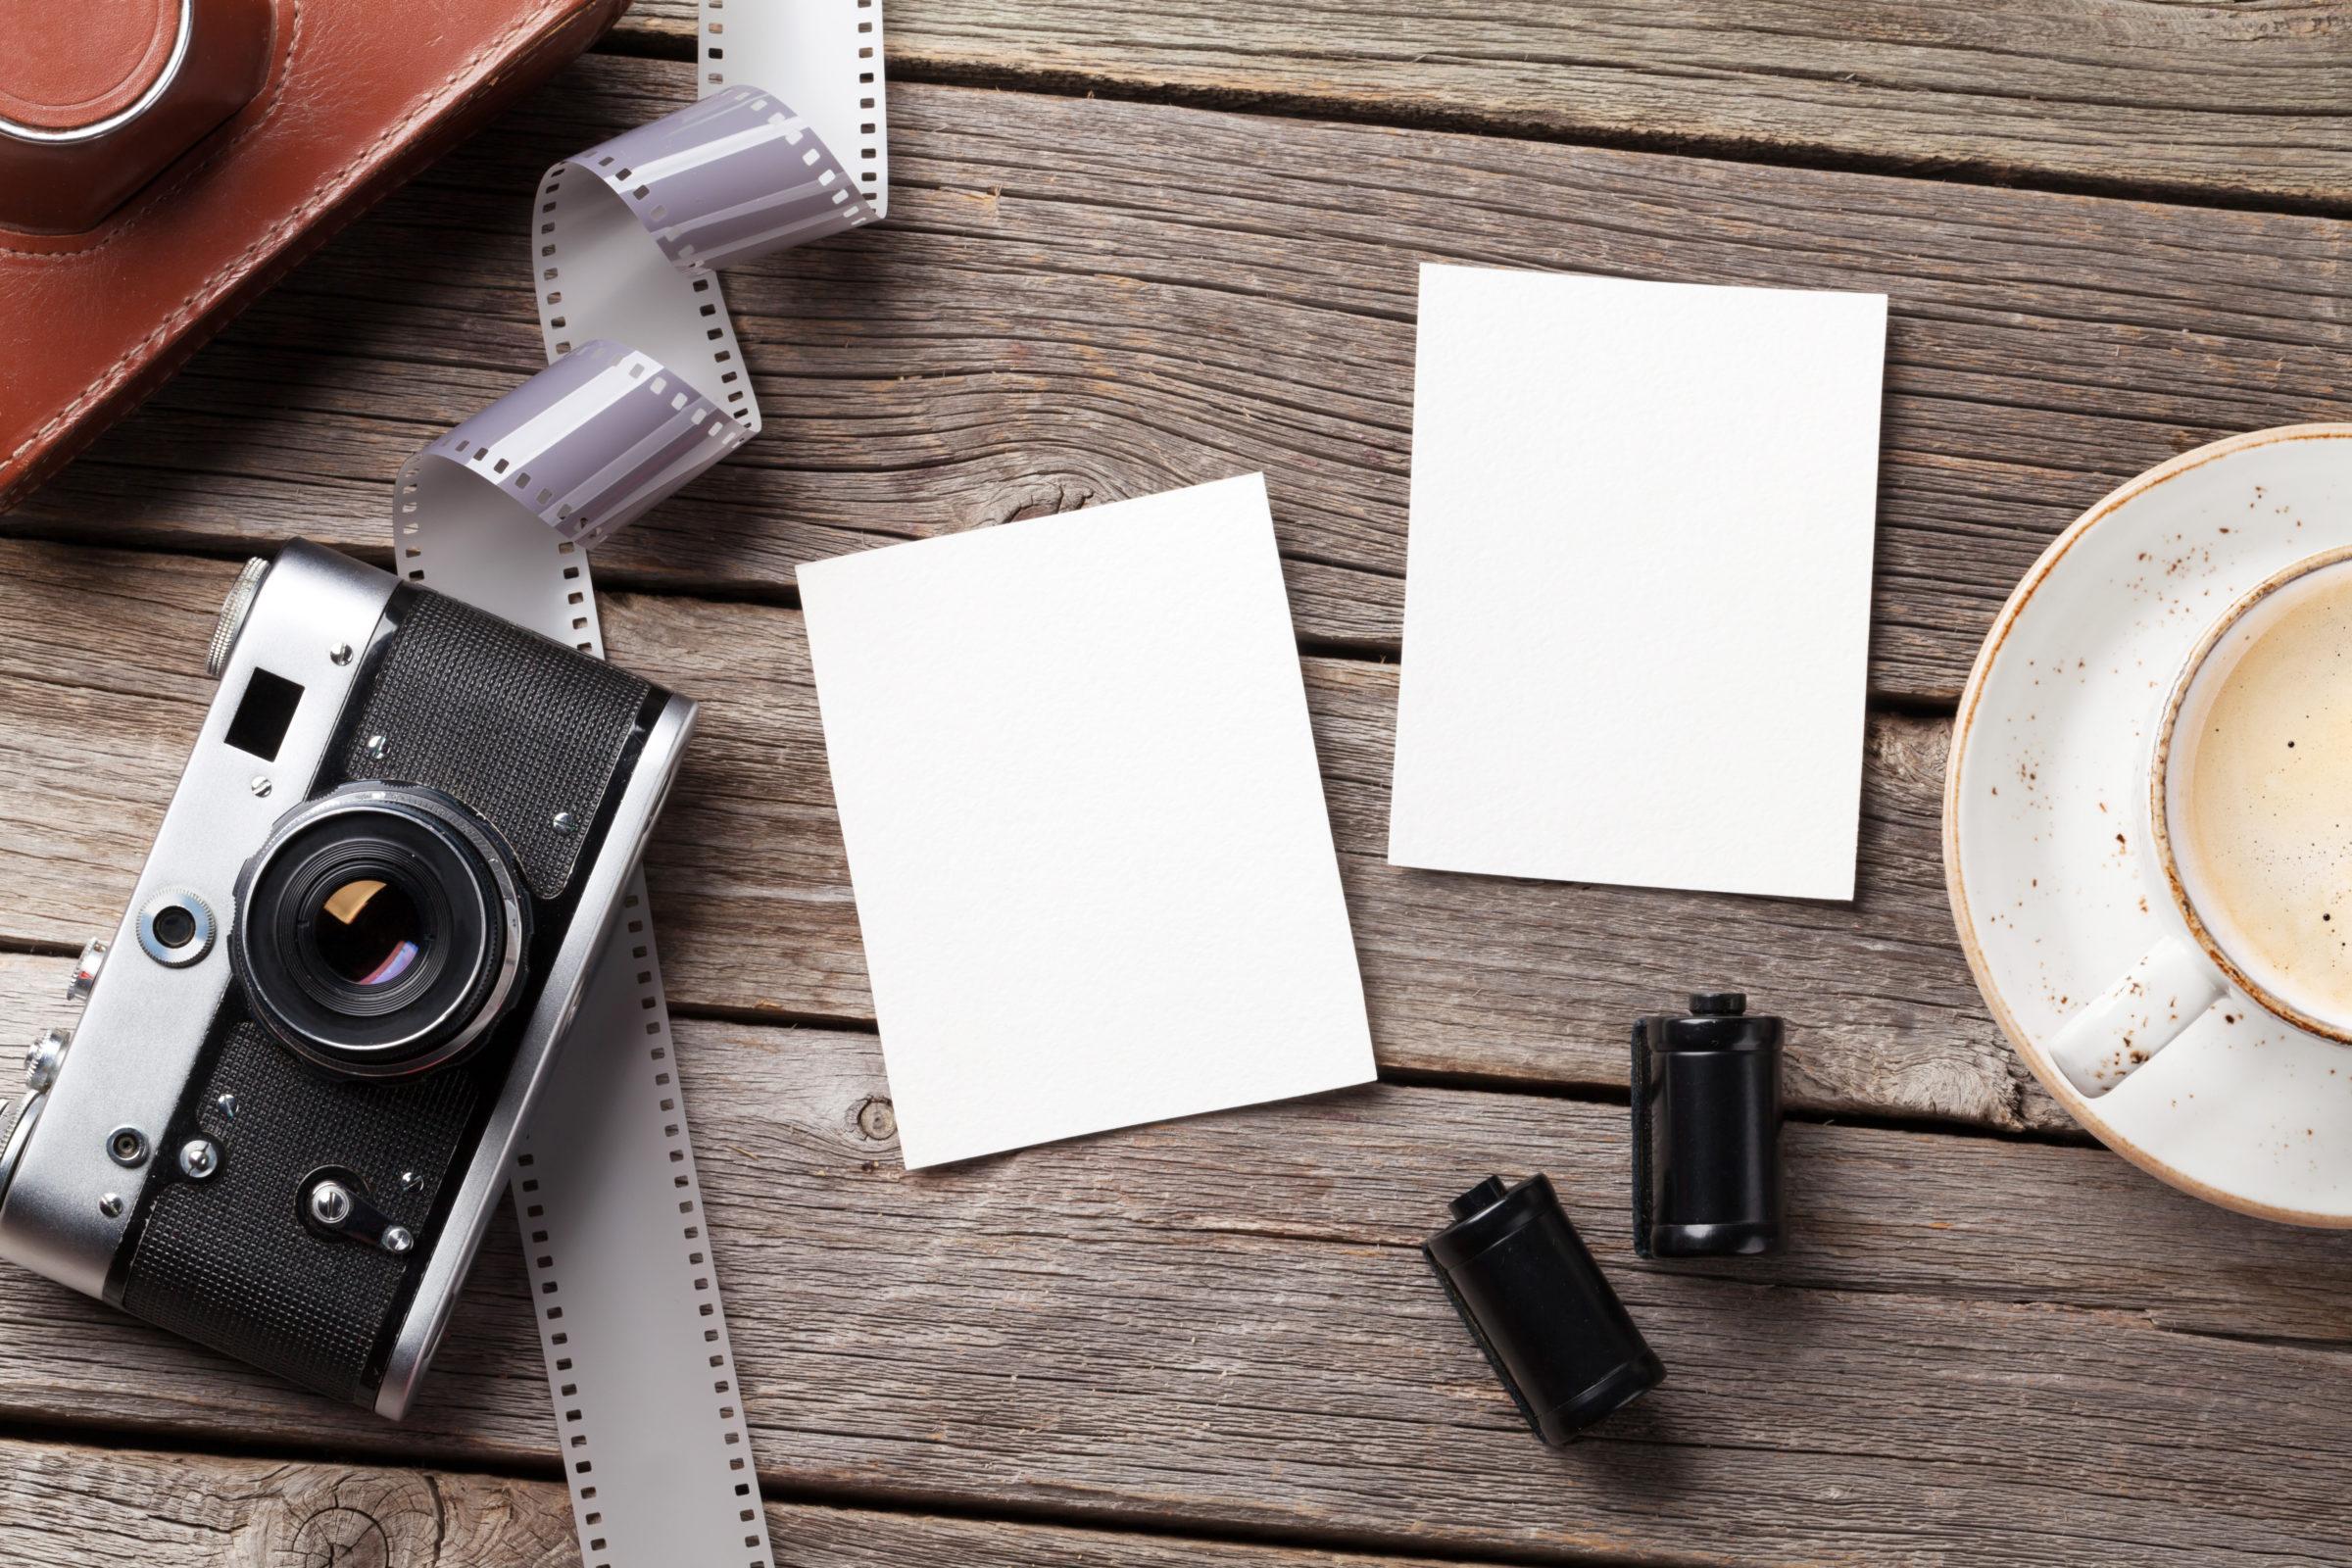 vintage camera and blank photo frames 97ETPBC